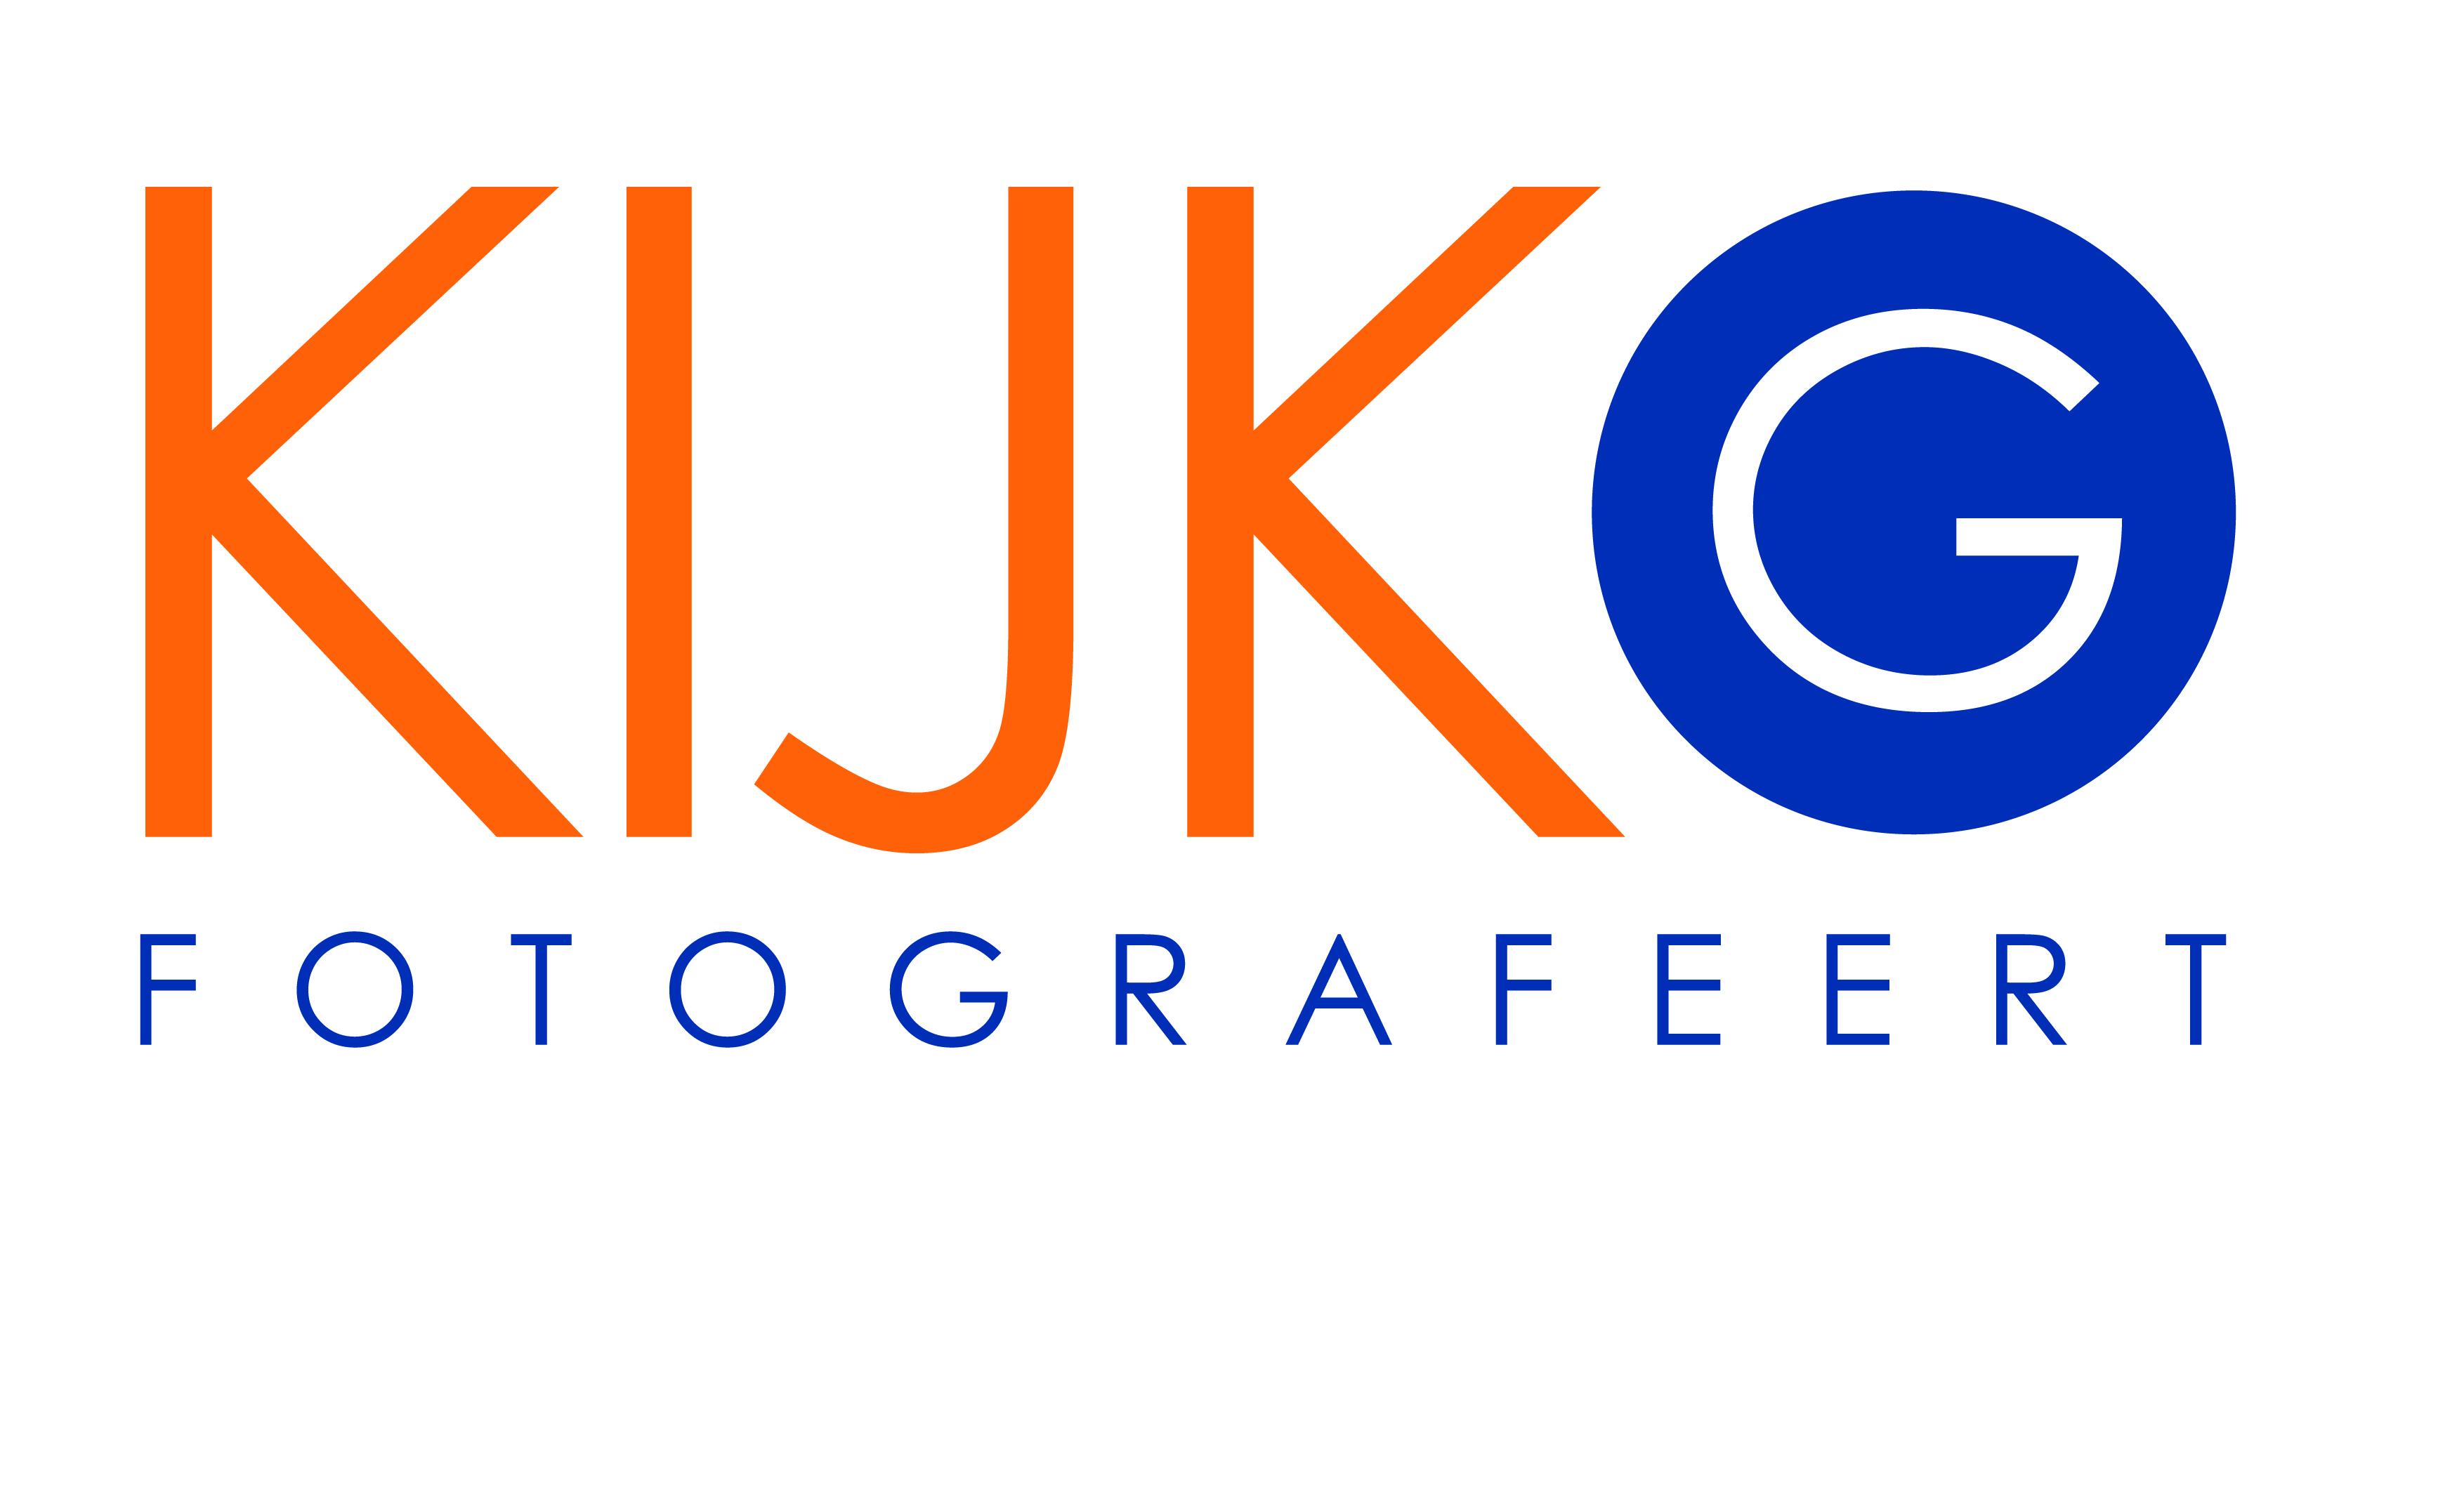 https://ivonnevandis.nl/wp-content/uploads/2018/12/KIJK-G-logo-oranje-donkerblauw.jpg